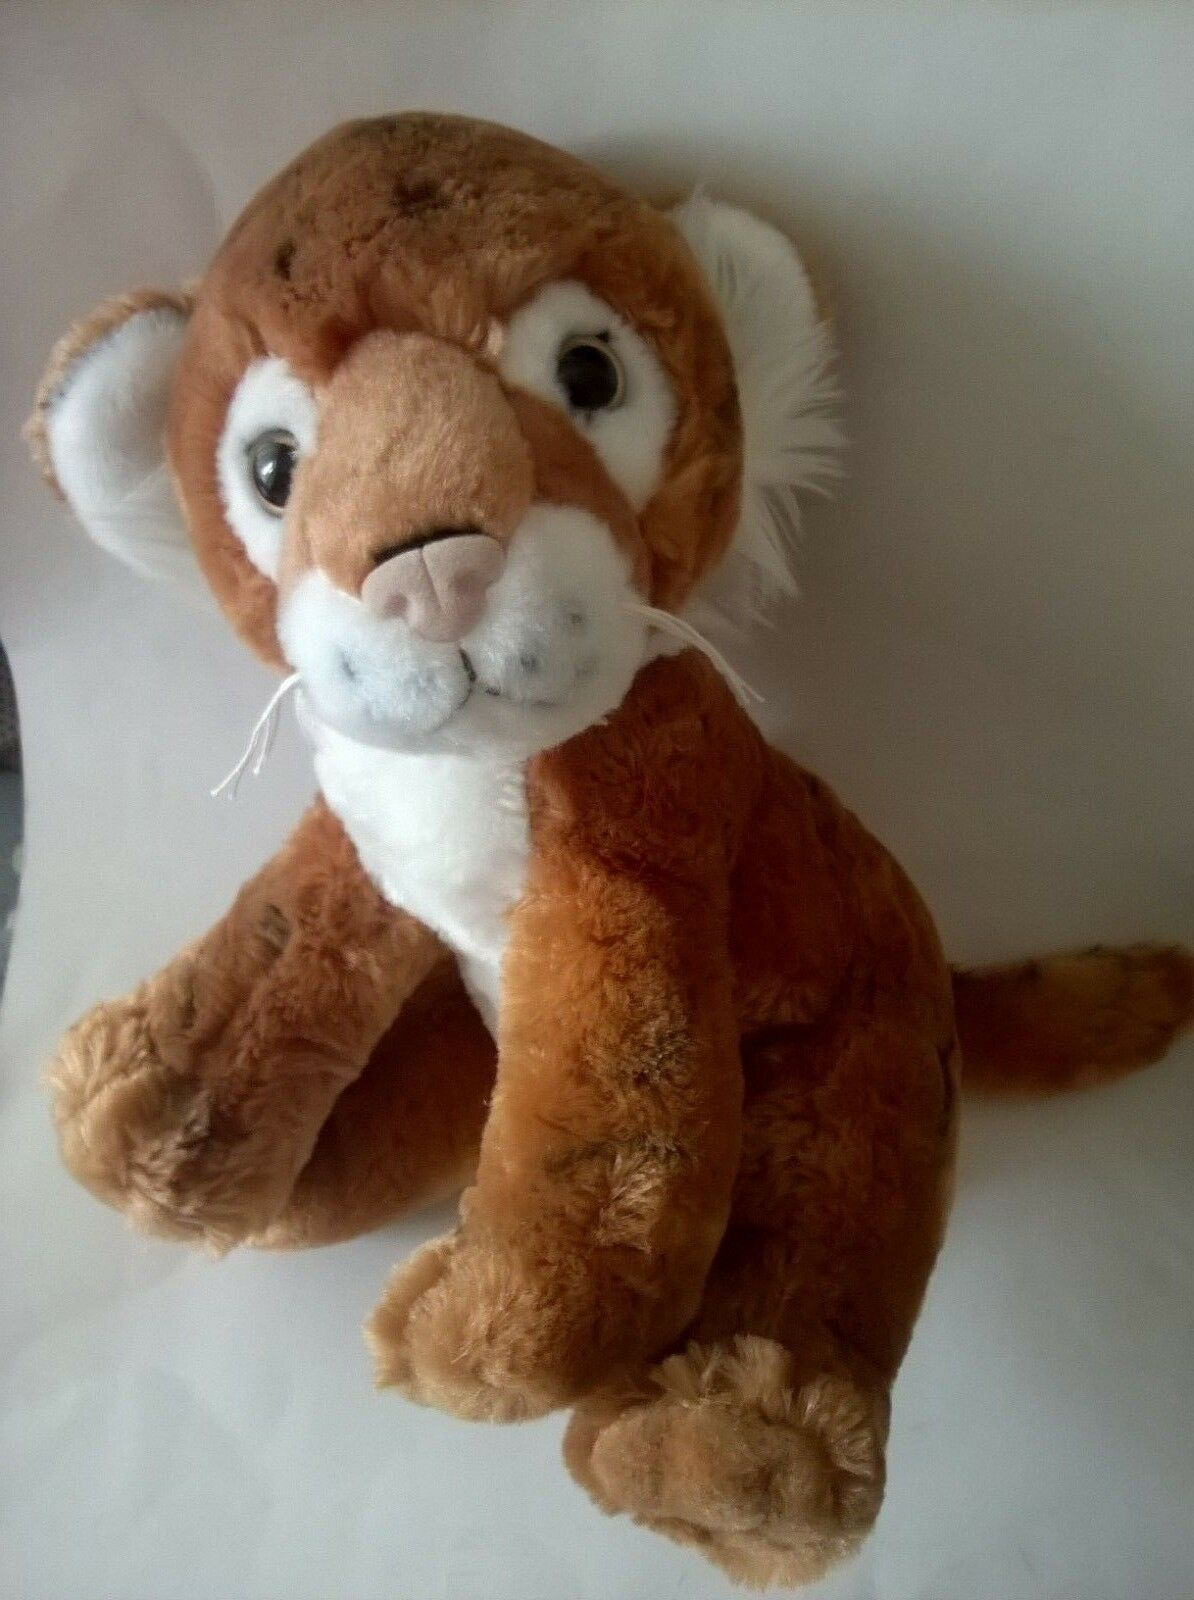 LION SOFT TOY LONGLEAT RAVENSDEN ZOO ANIMAL PLUSH WILD ANIMAL SAFARI